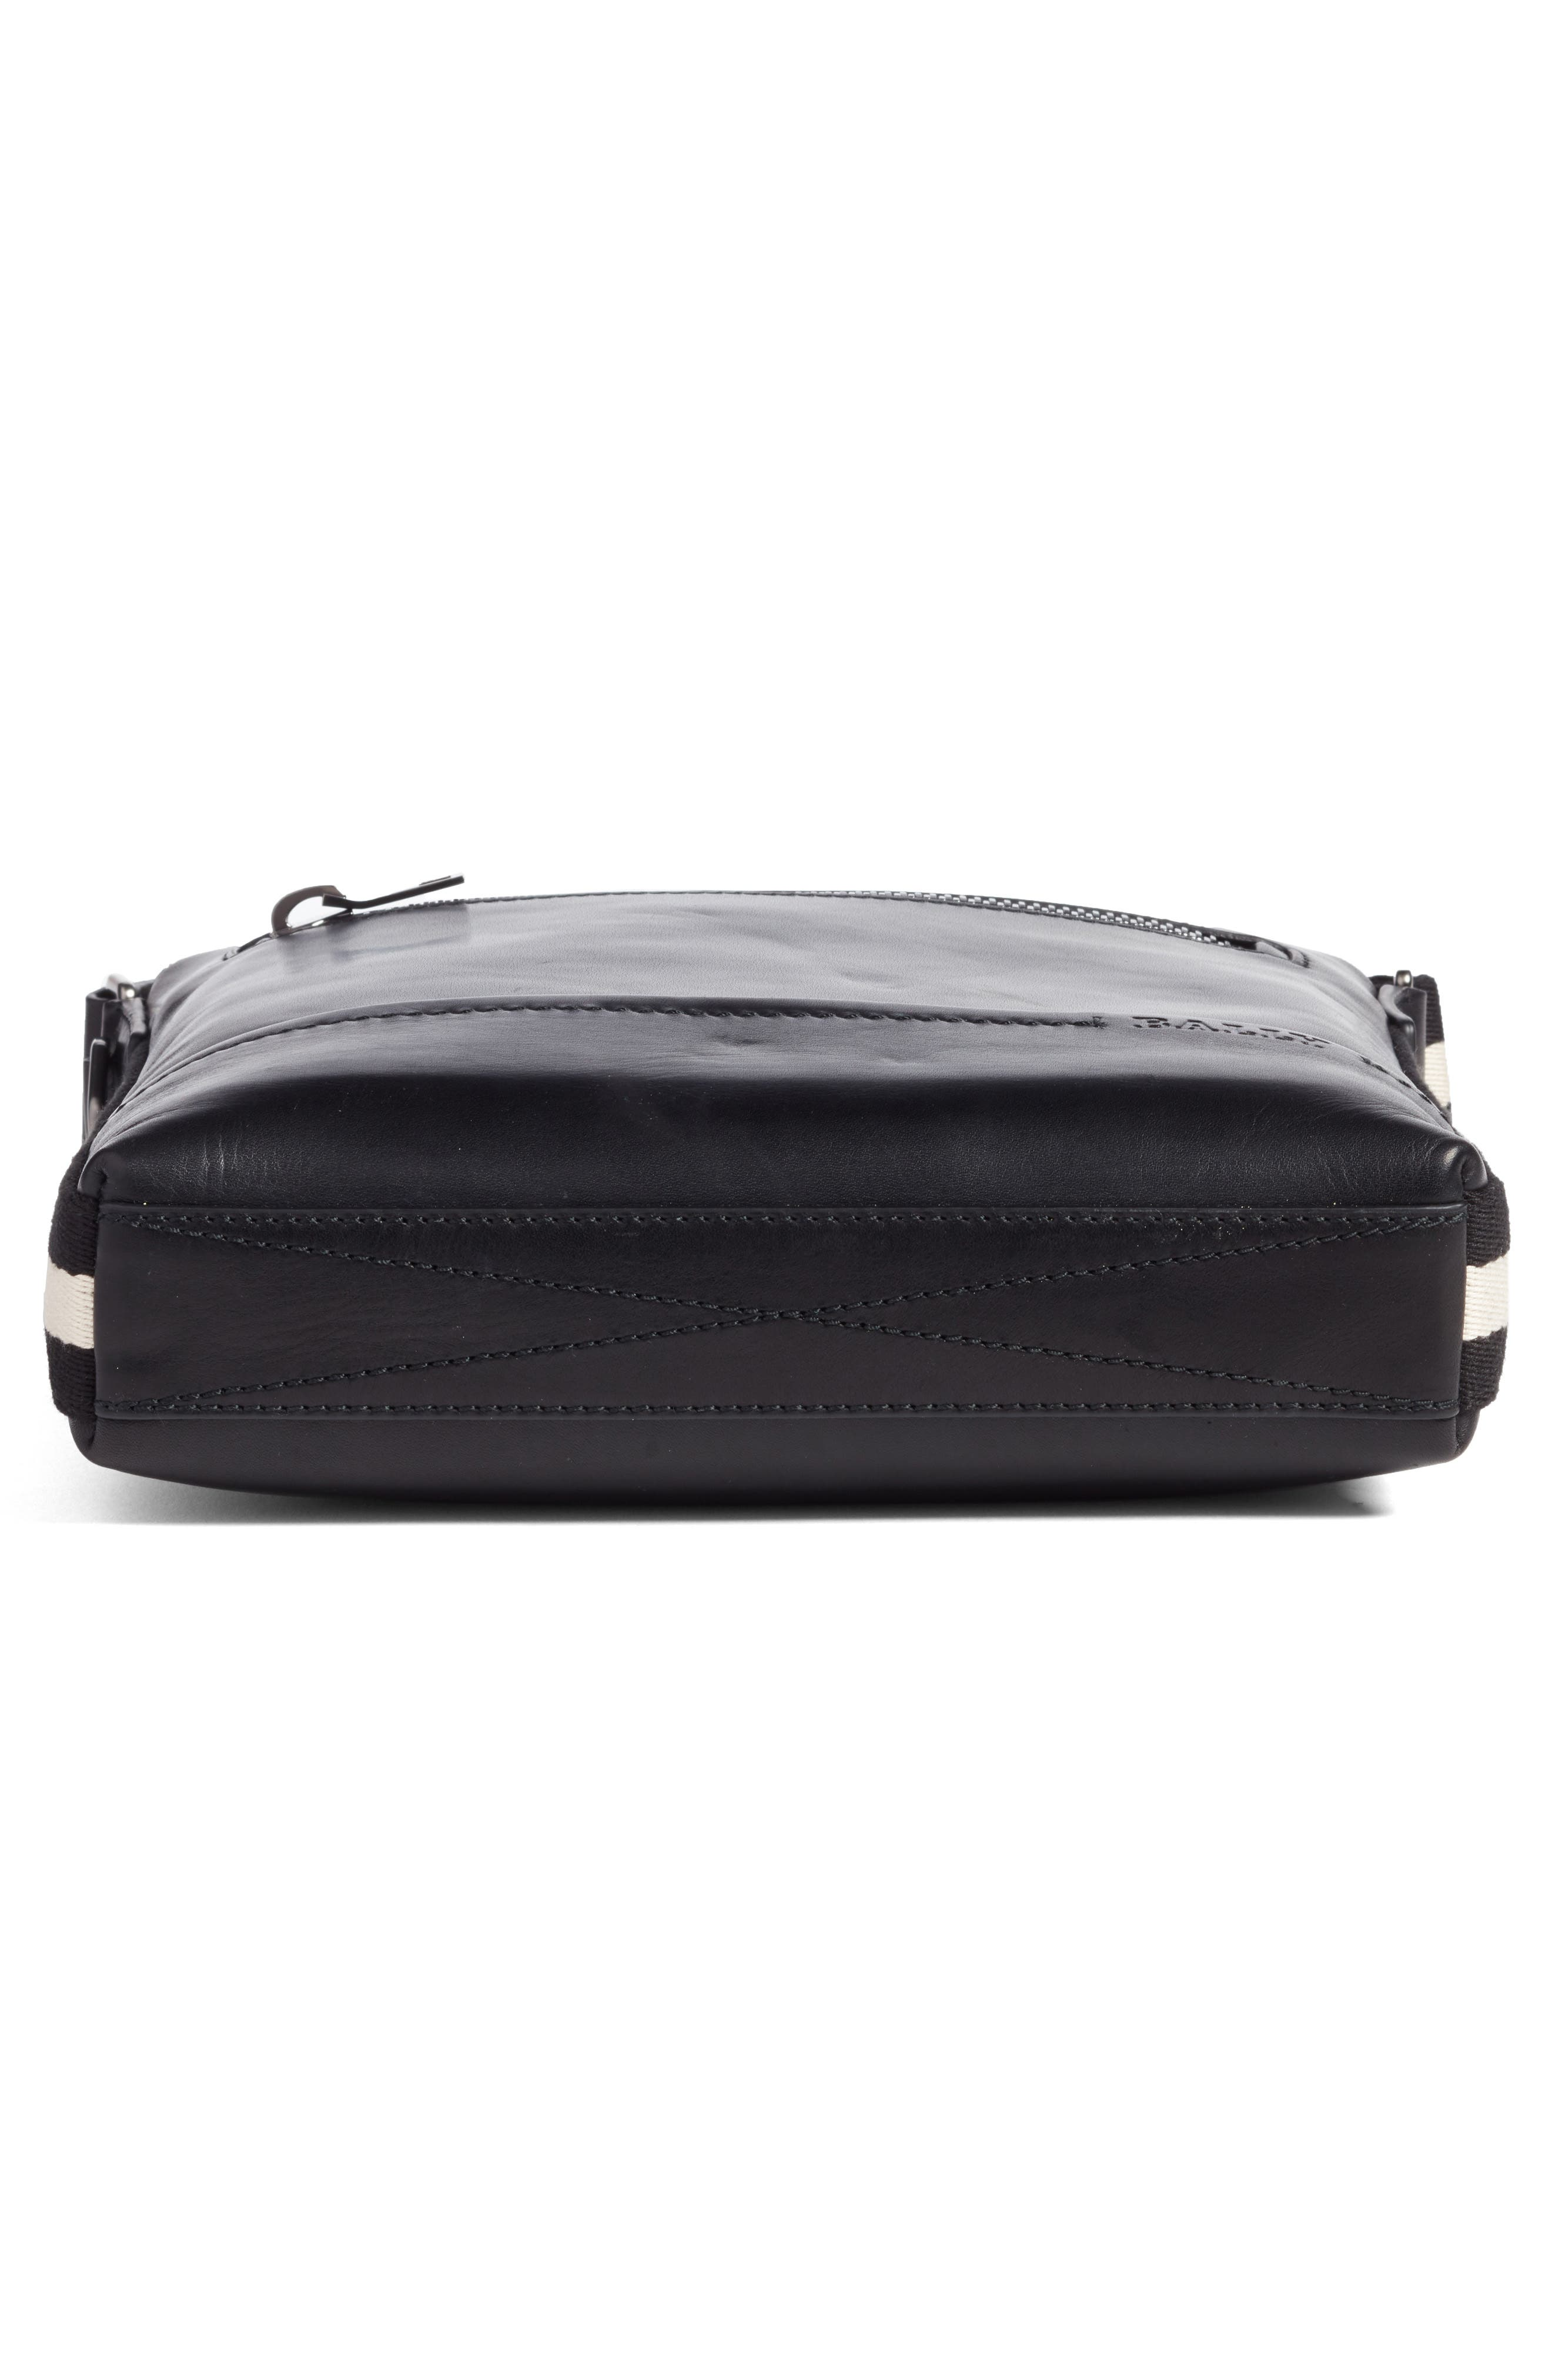 BALLY,                             Trezzini Leather Crossbody Bag,                             Alternate thumbnail 6, color,                             001